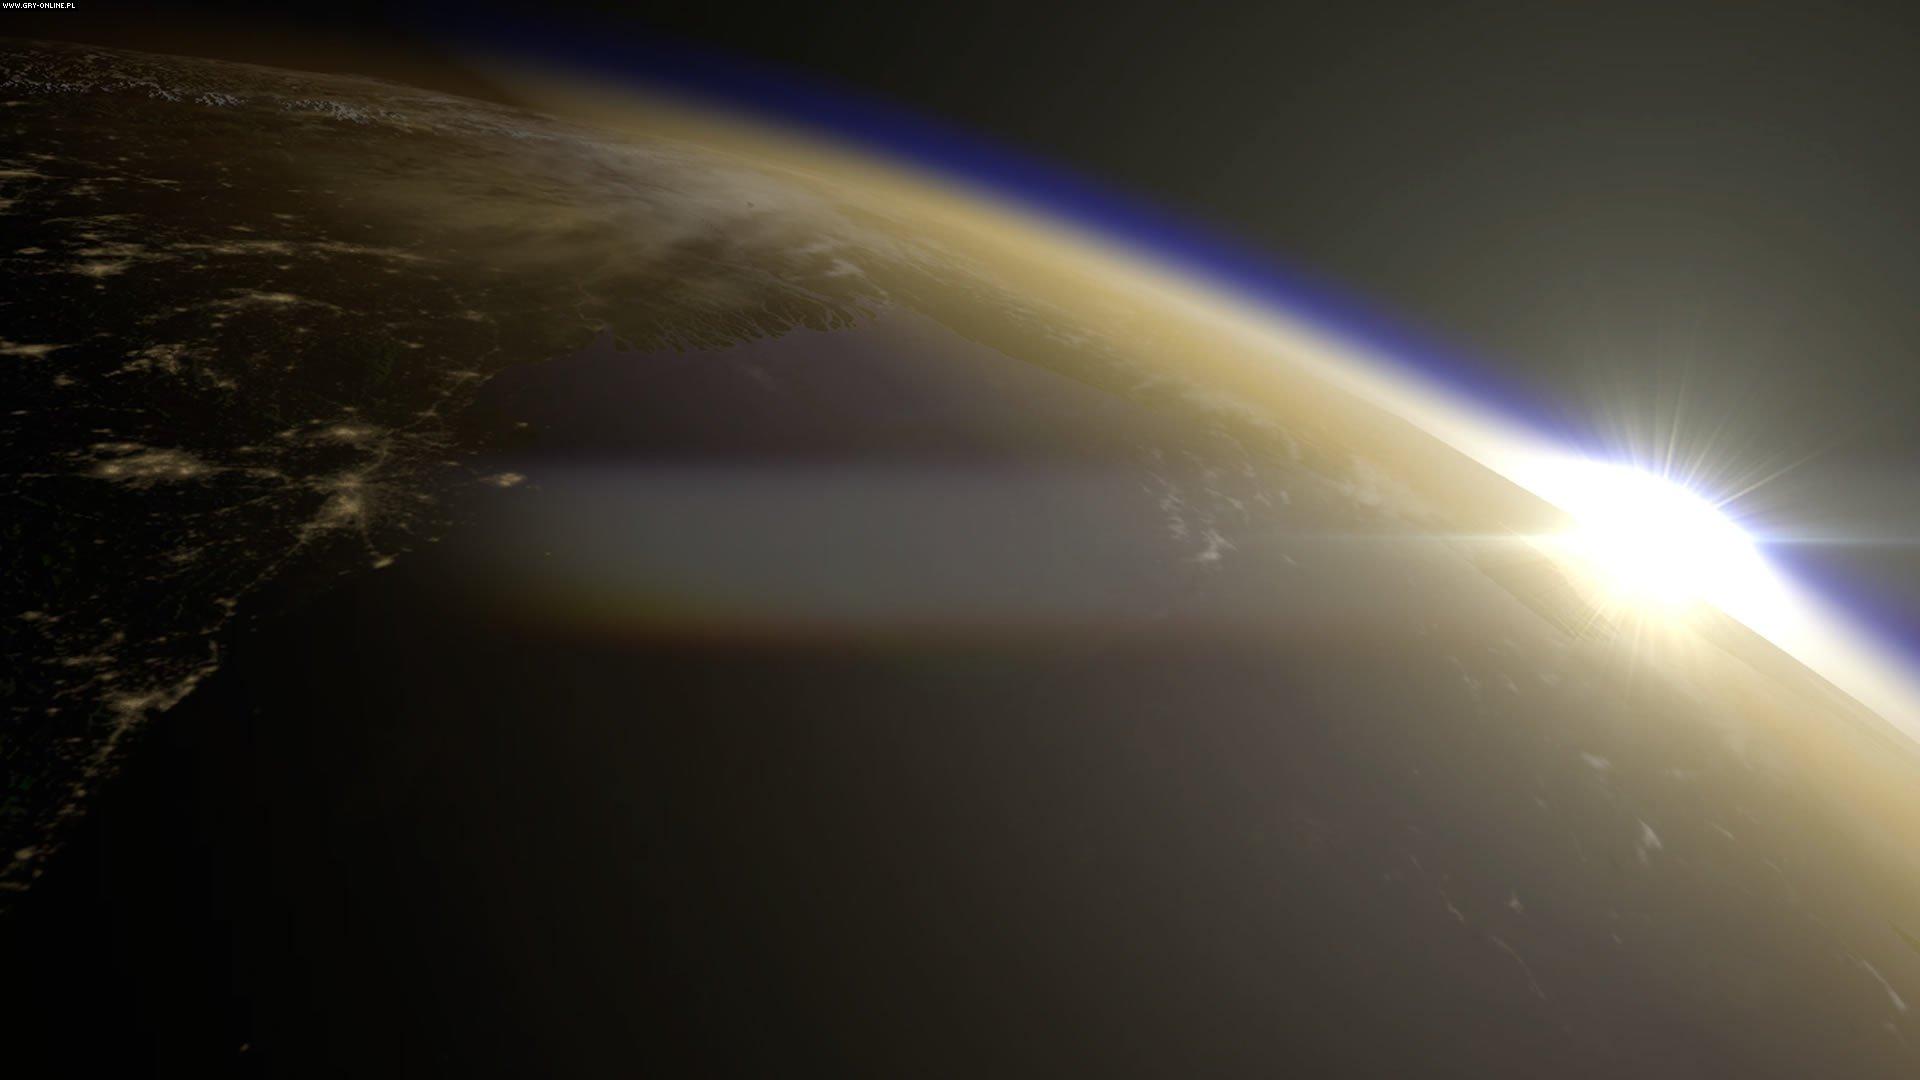 Apollo 11 VR - screenshots gallery - screenshot 4/7